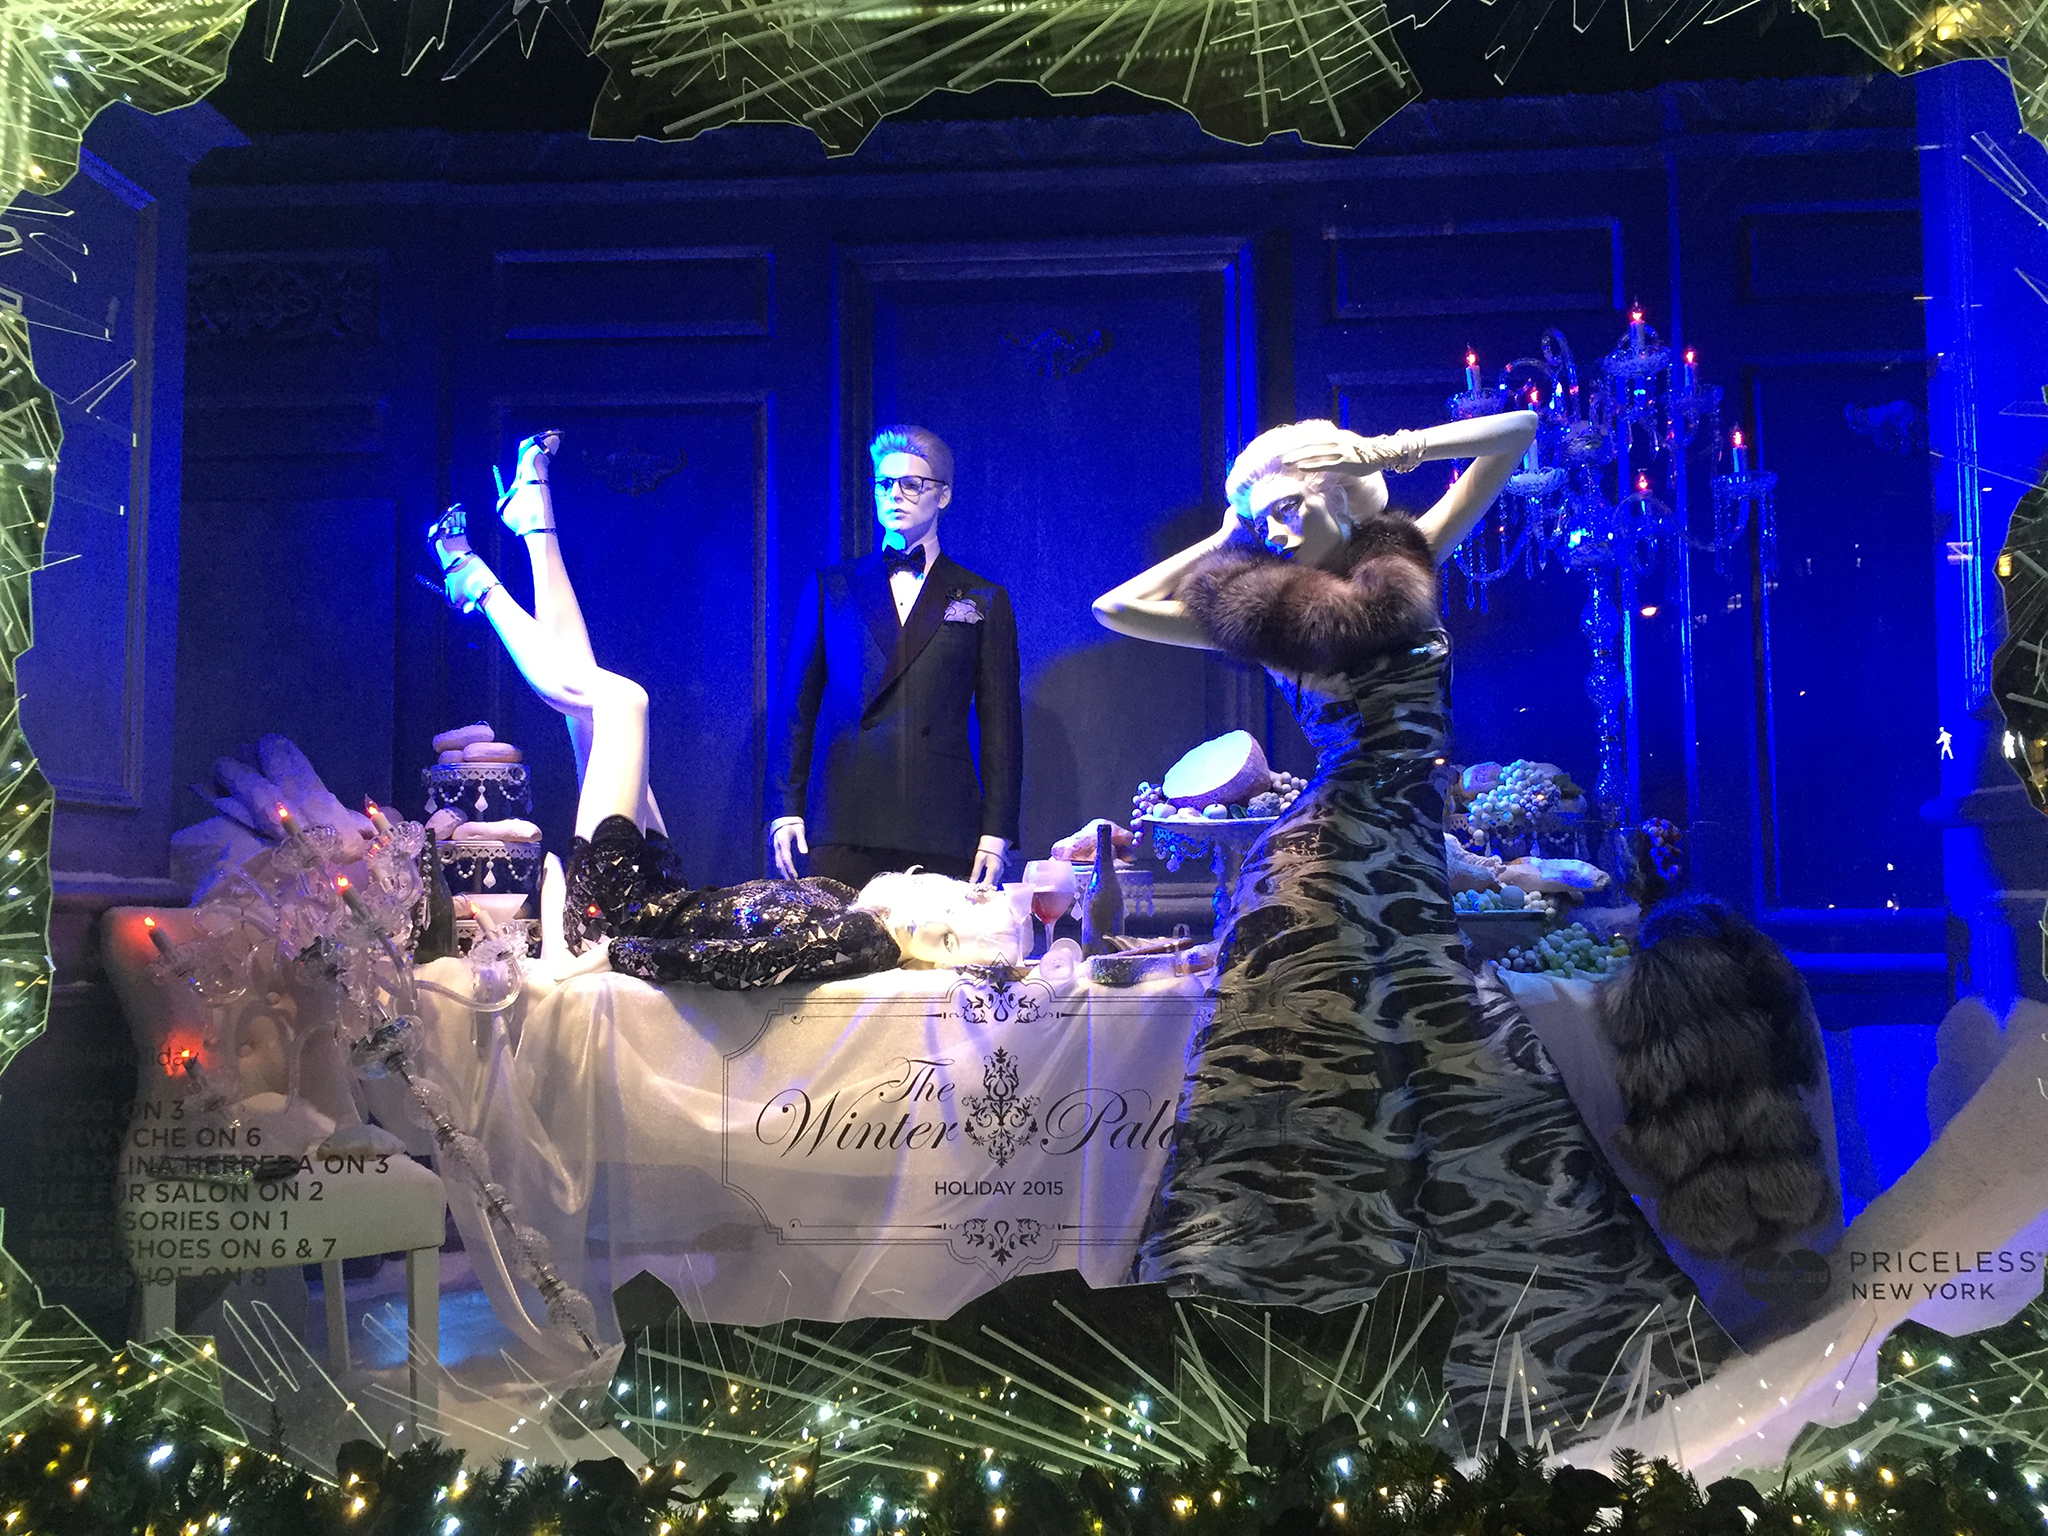 Saks-5th-Ave-Holiday-Windows-01